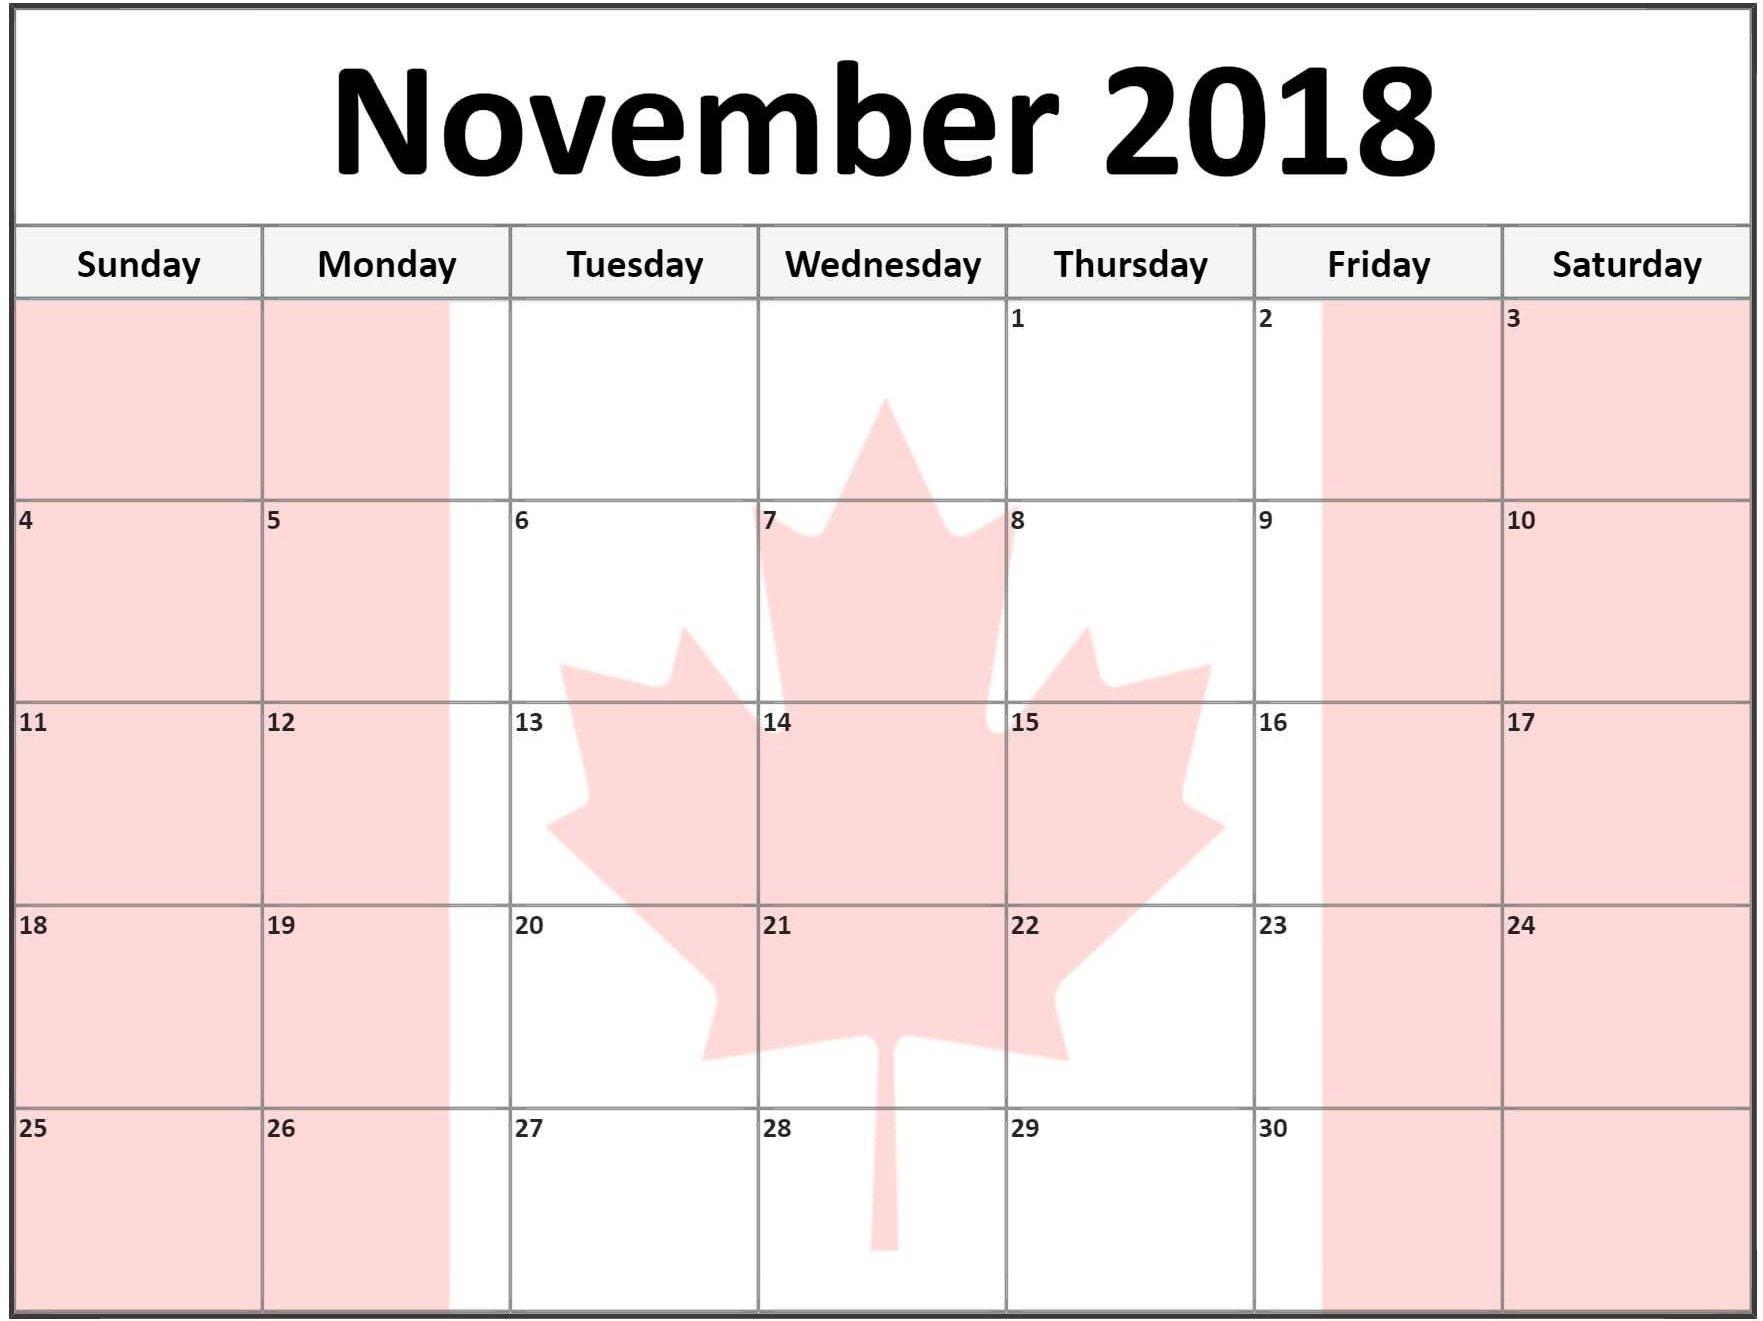 November 2018 Pink Calendar